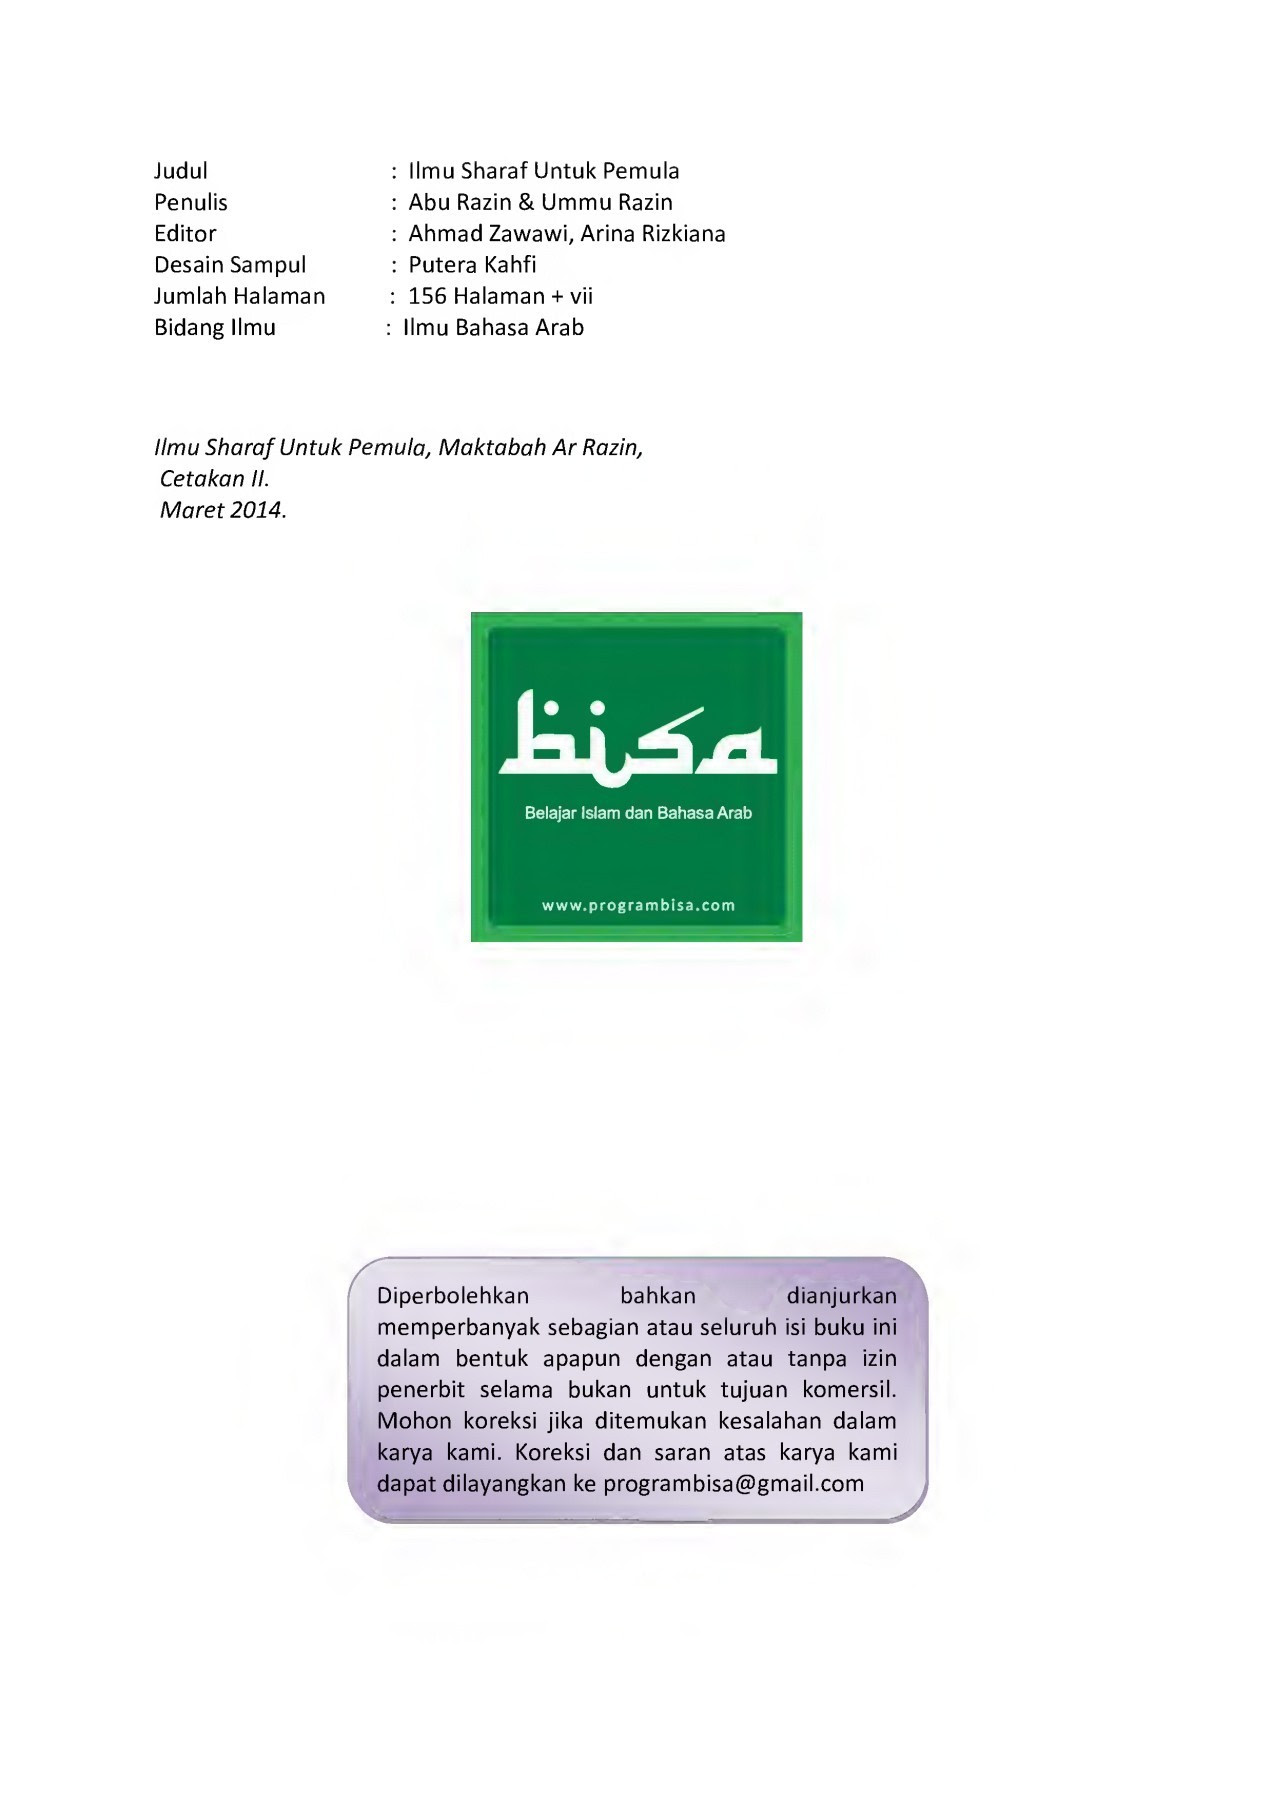 Ebook Ilmu Sharaf Untuk Pemula Cetakan 2 Rev 02 Pages 1 50 Text Version